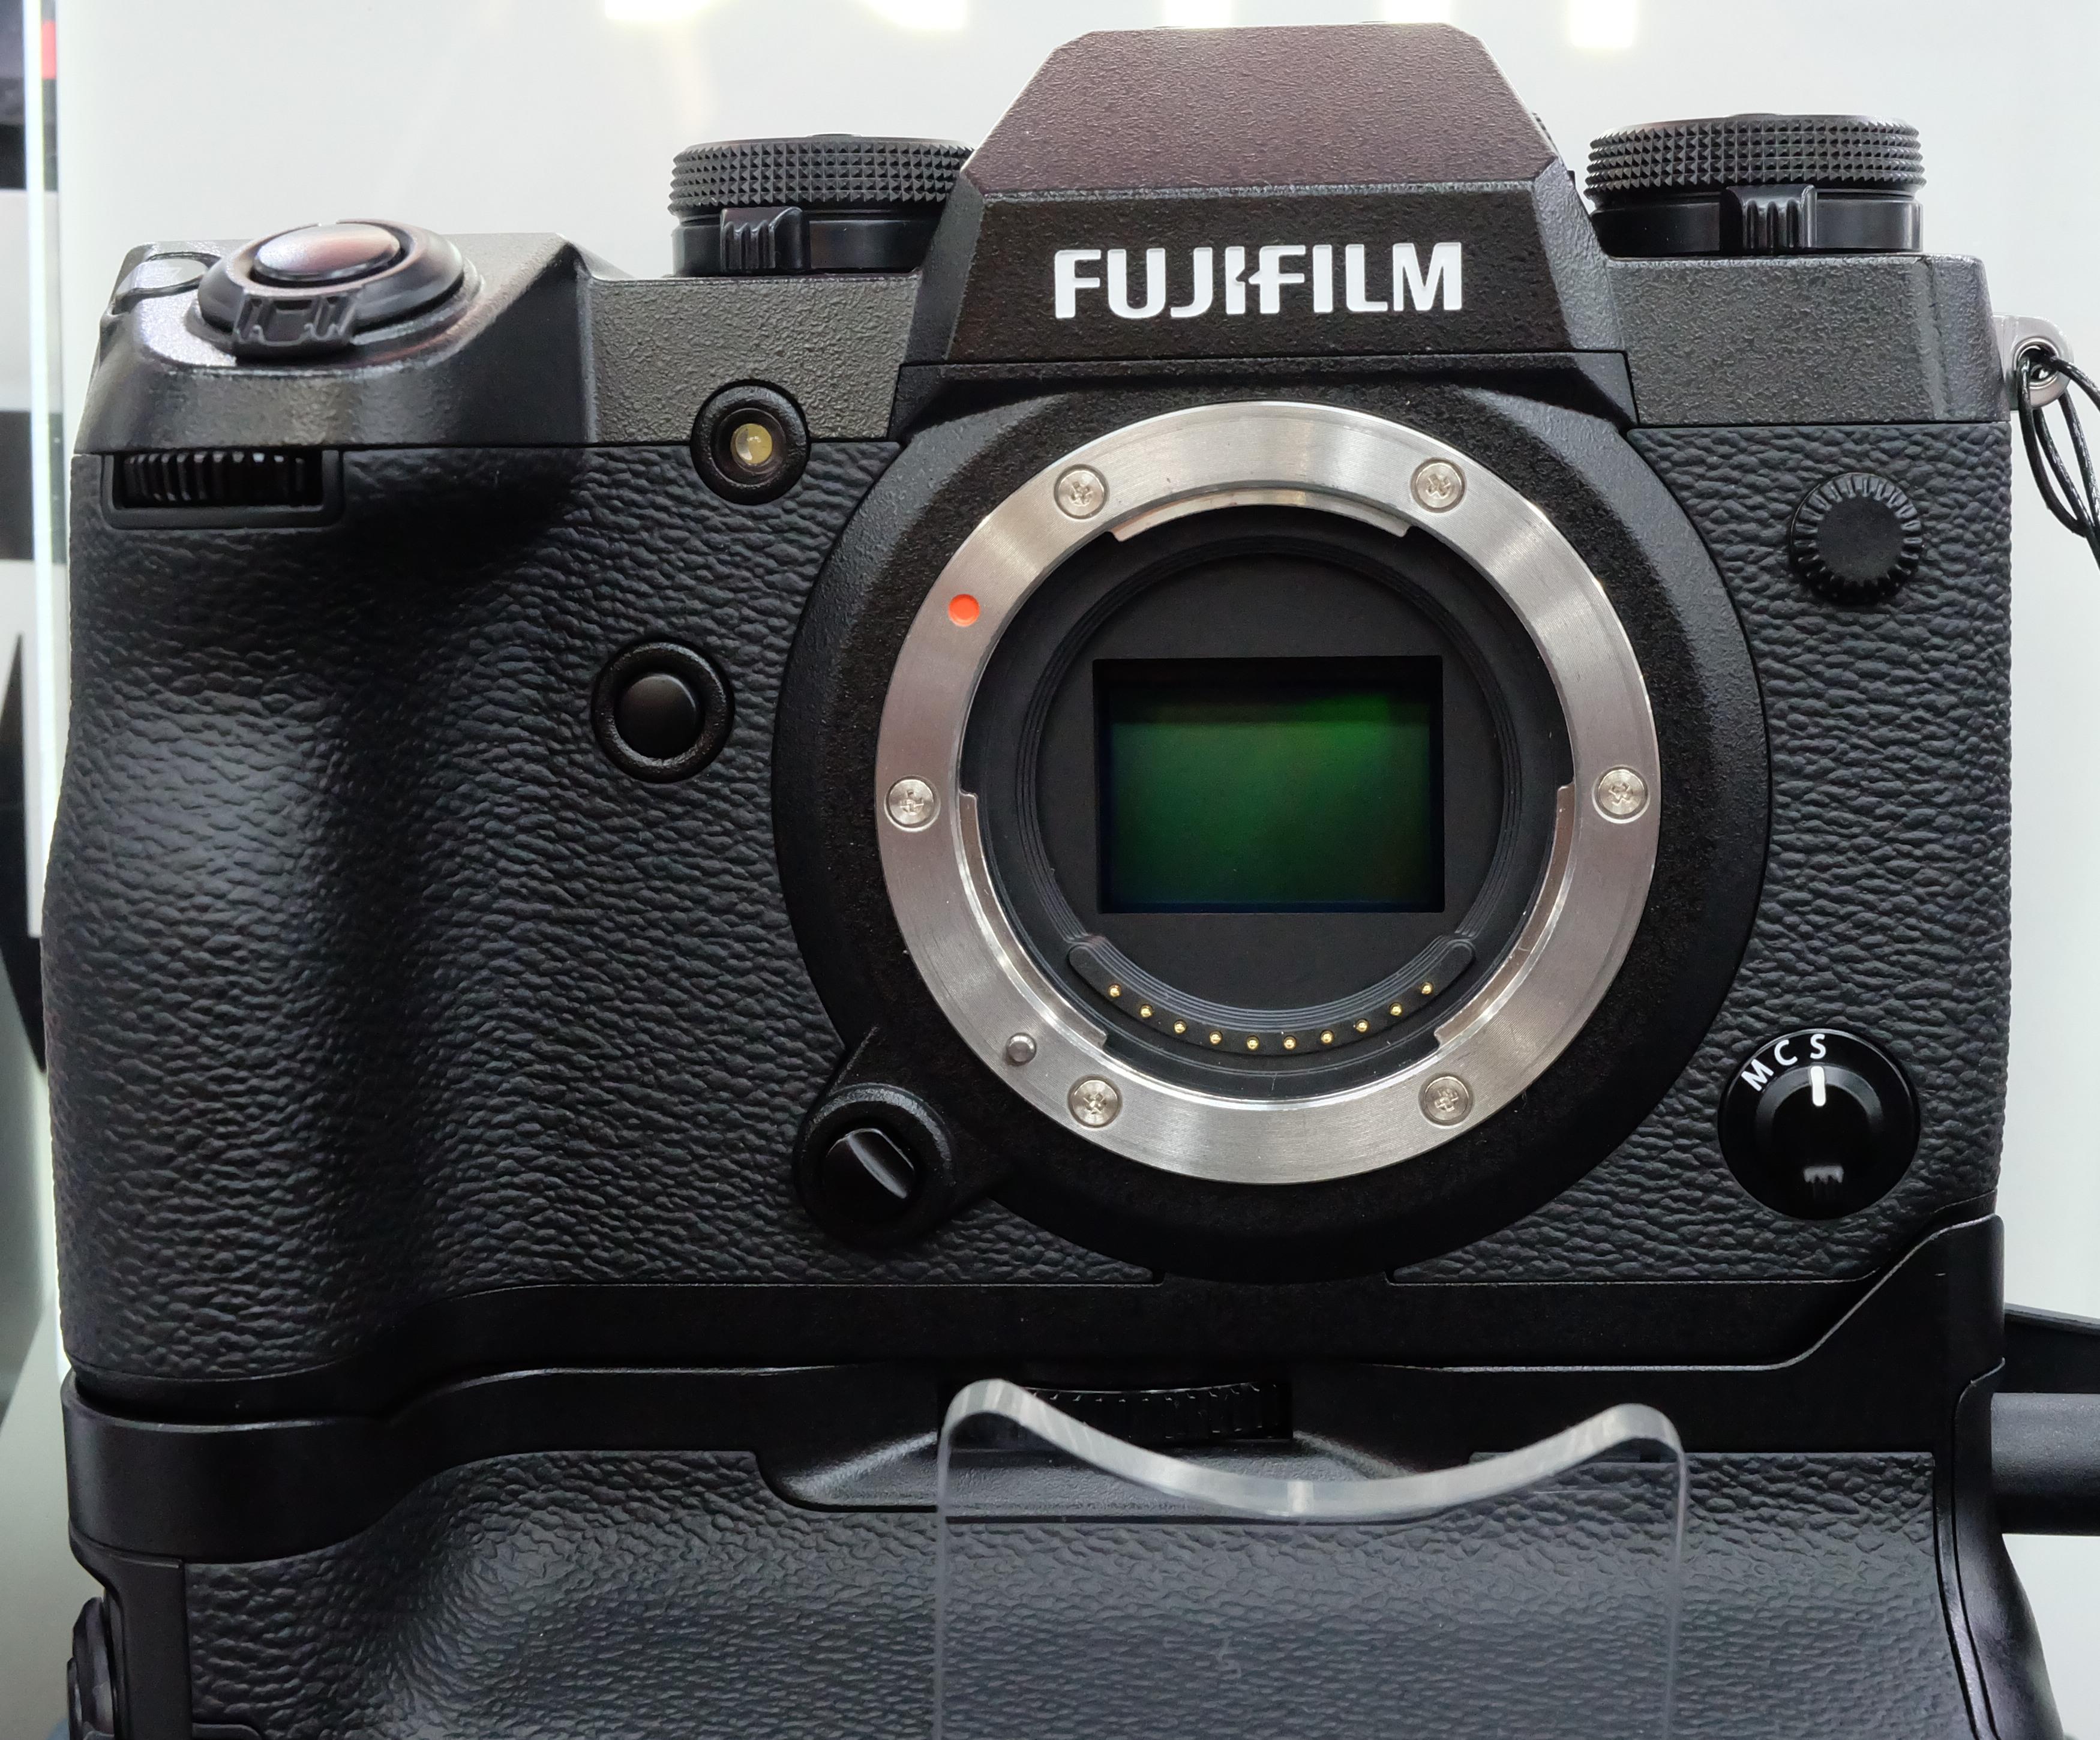 Fujifilm X series - Wikipedia